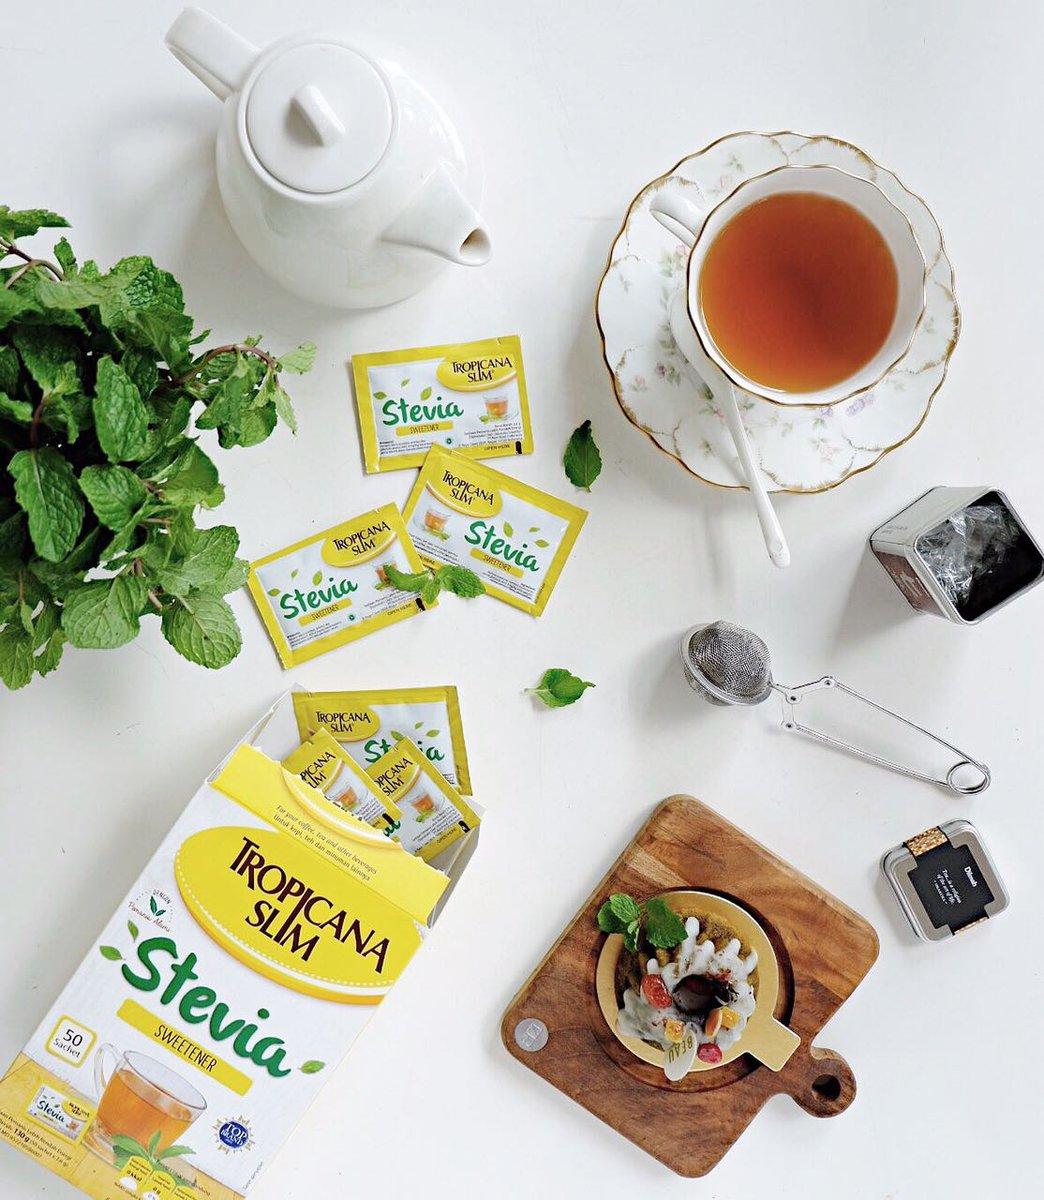 Tropicana Slim On Twitter Pemanis Nol Kalori Untuk Menggantikan Stevia Gula Harian Kamu Dari Daun